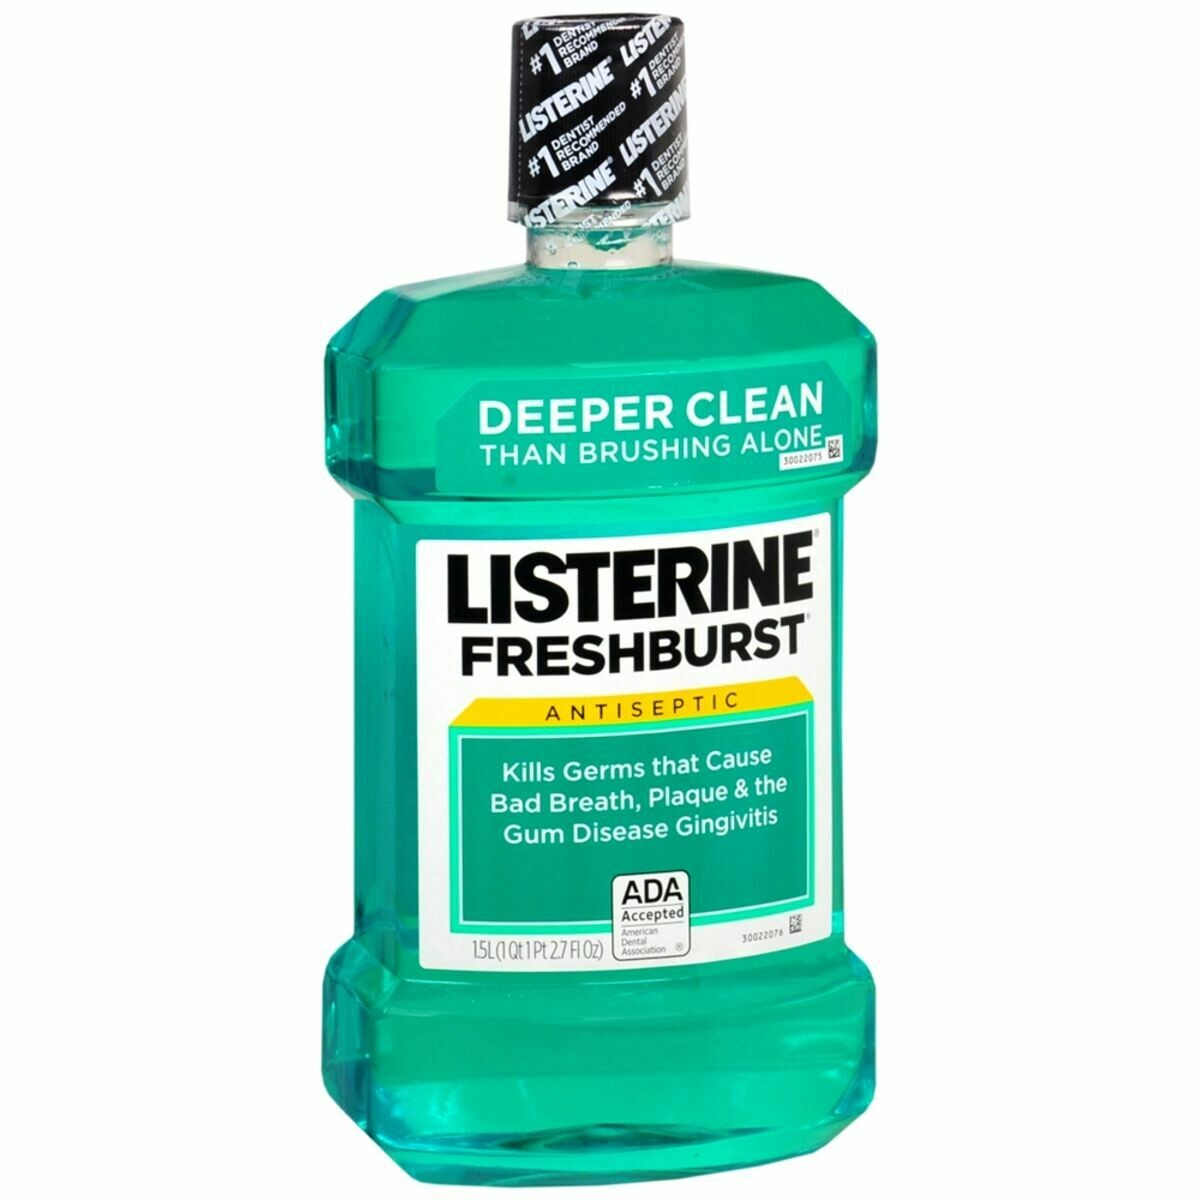 Listerine Freshburst 1.5L